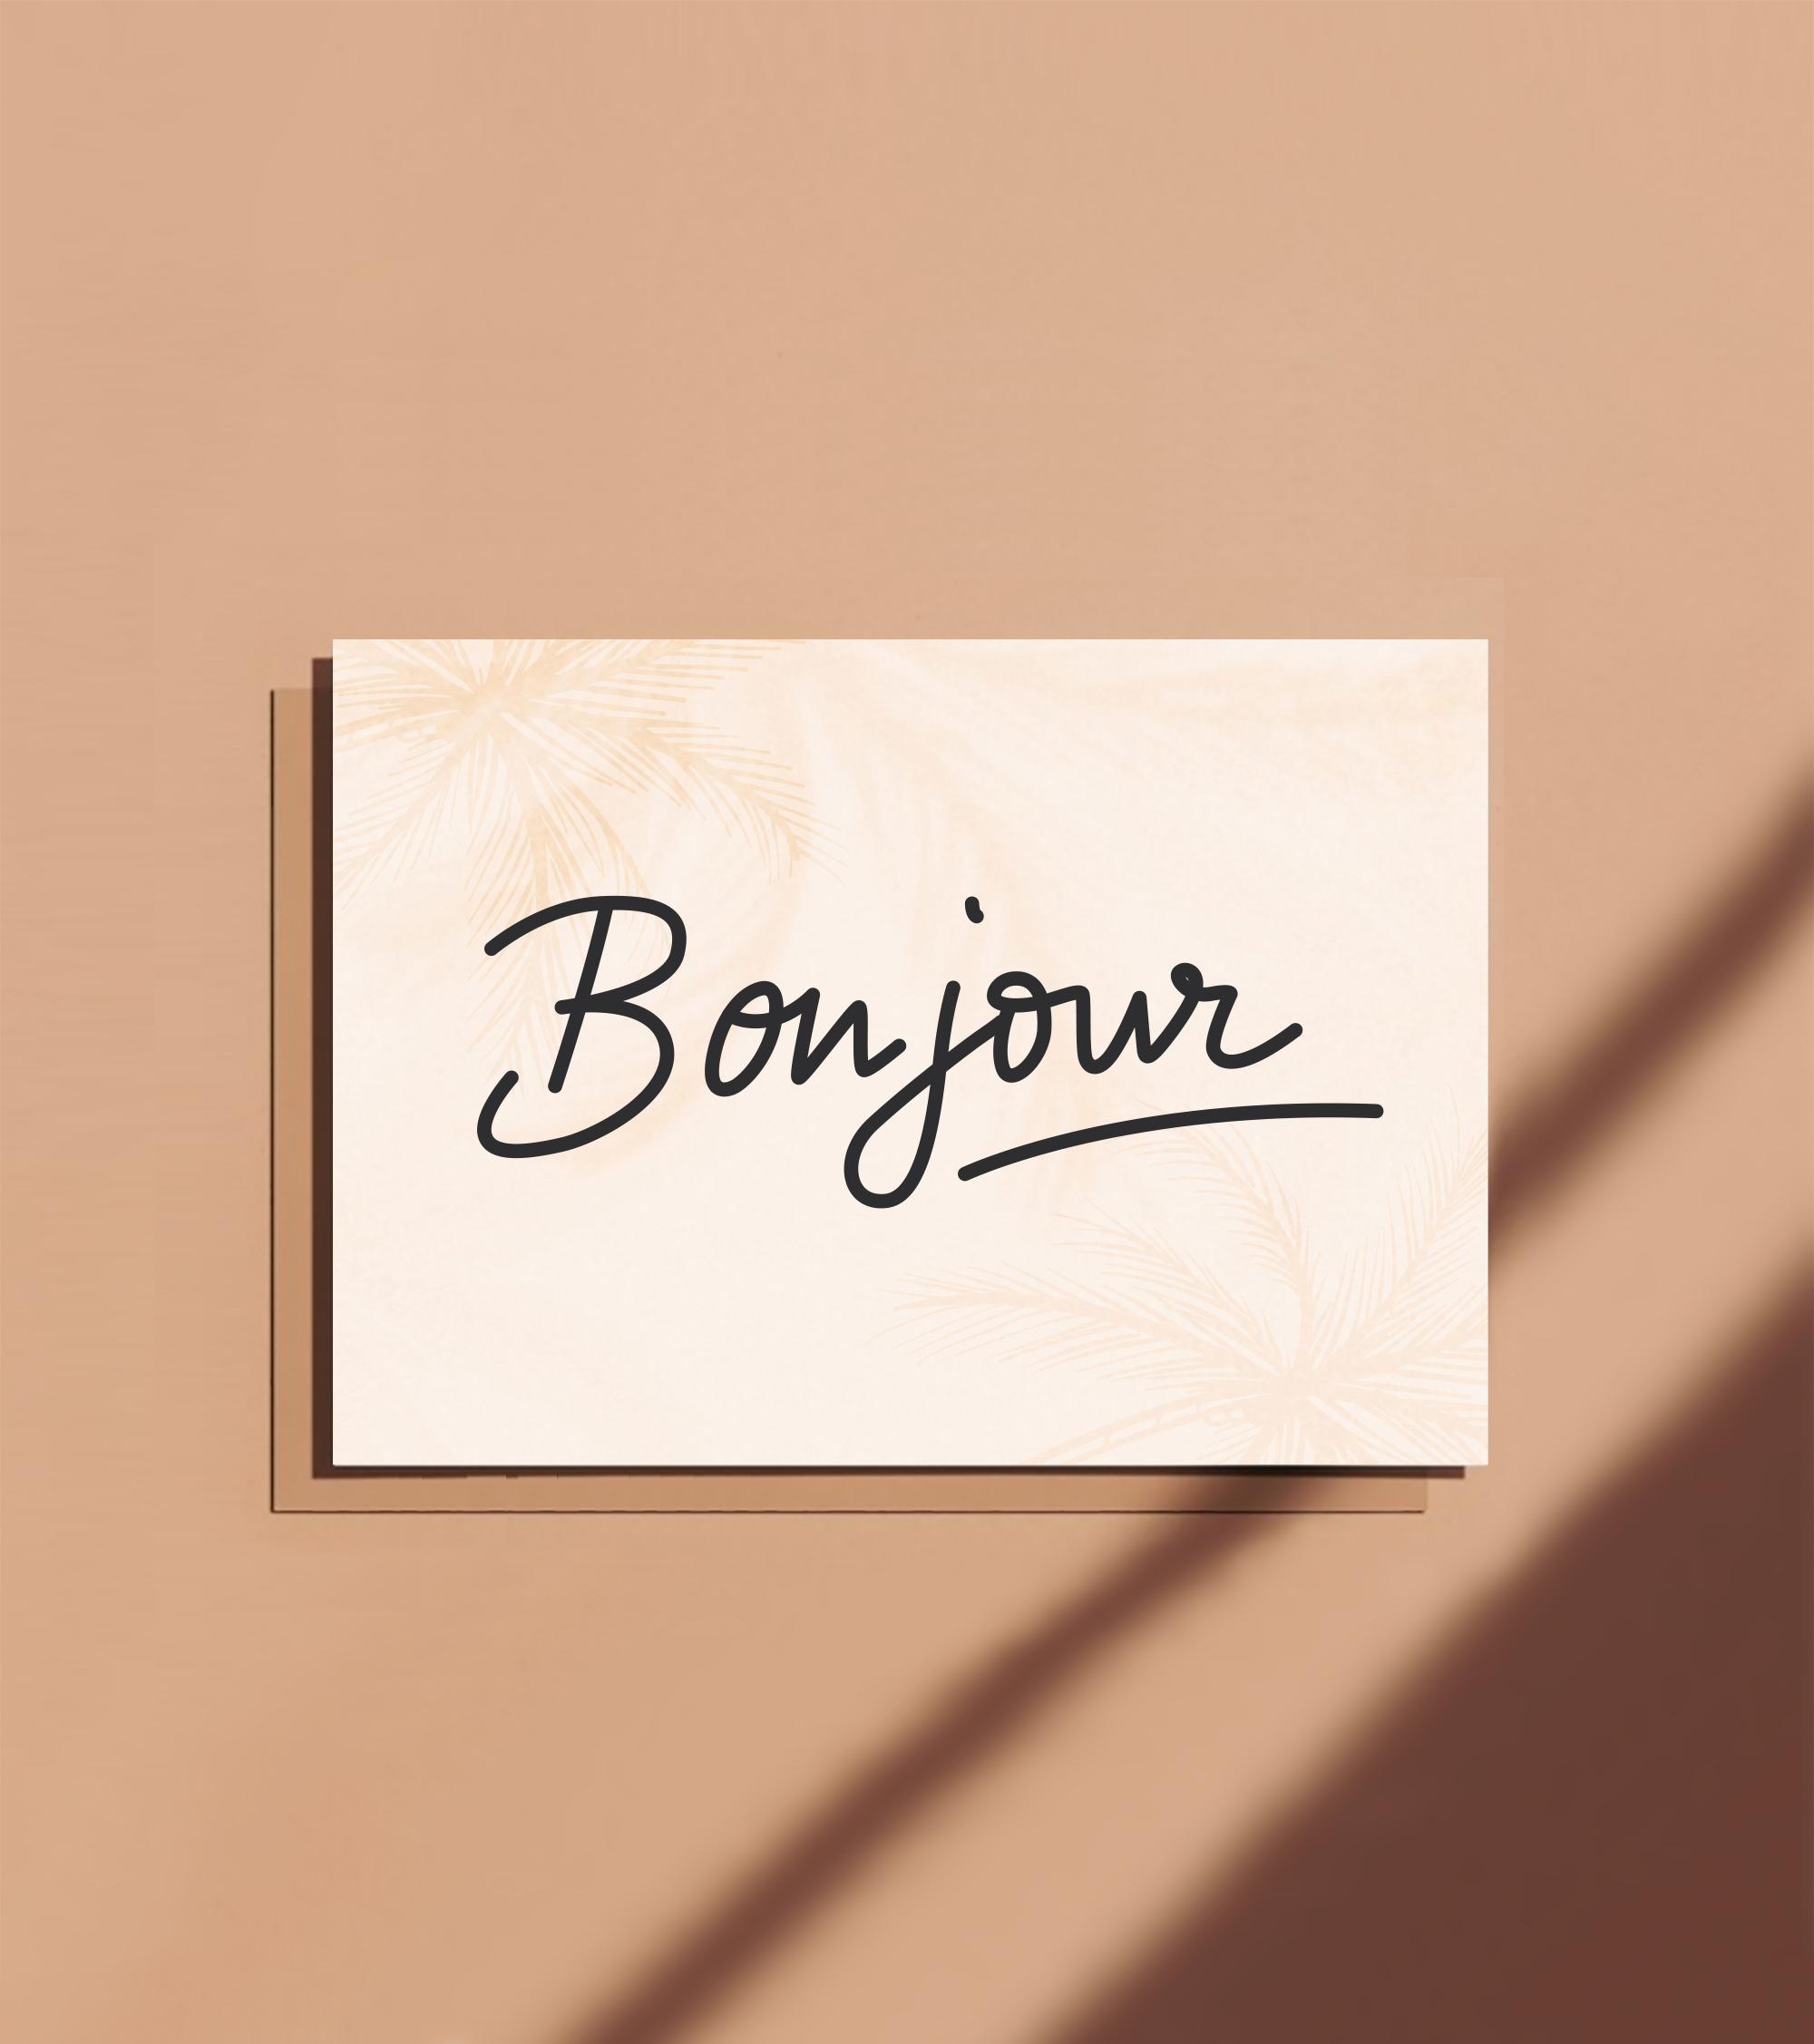 carte postale bonjour motivation